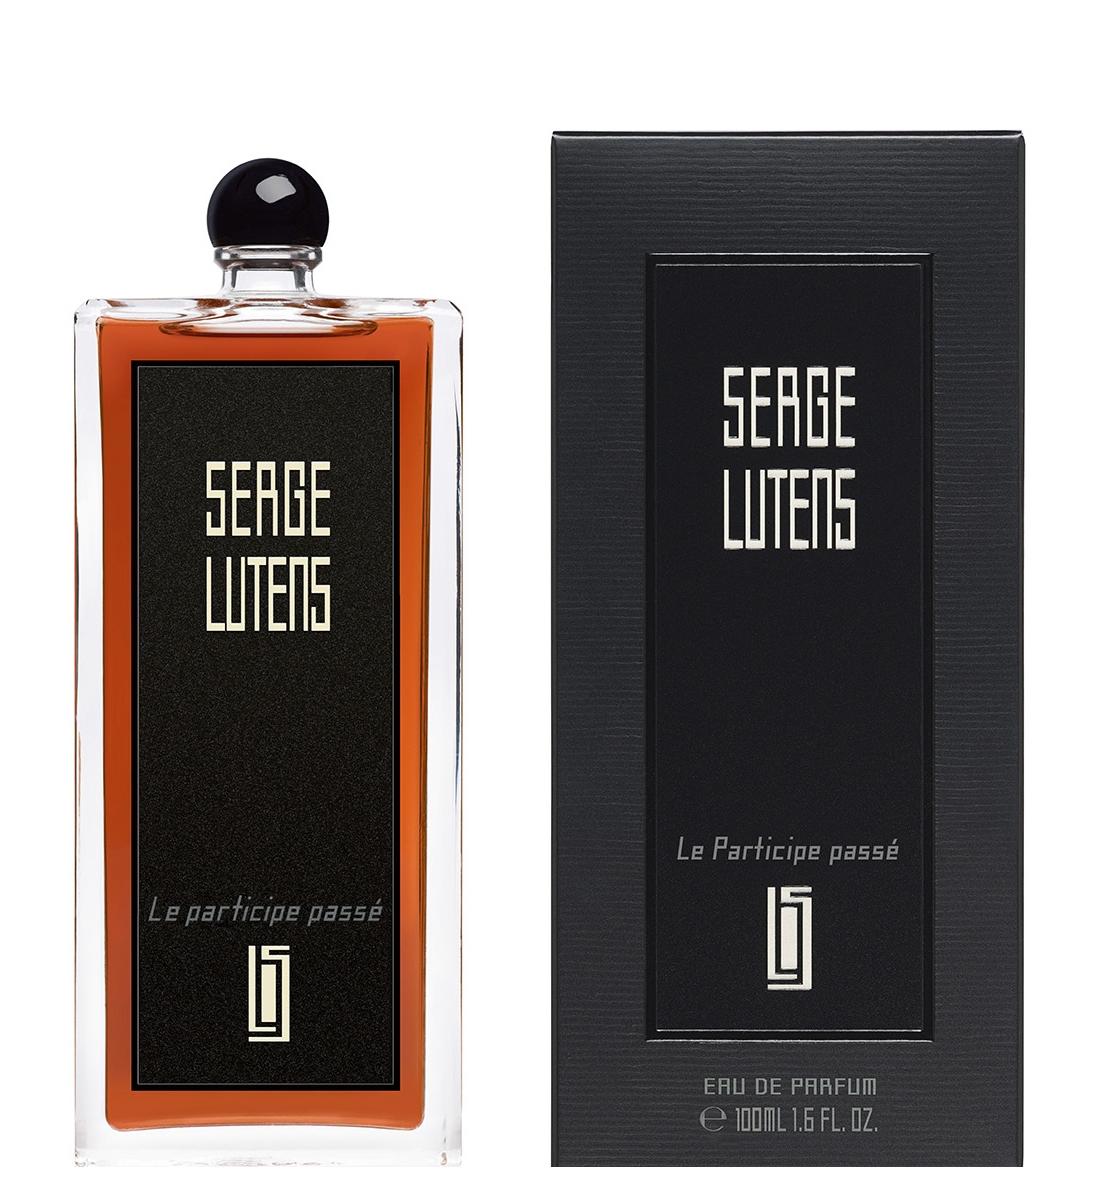 Парфюмерная вода 100 мл Serge Lutens Le Participe Passe